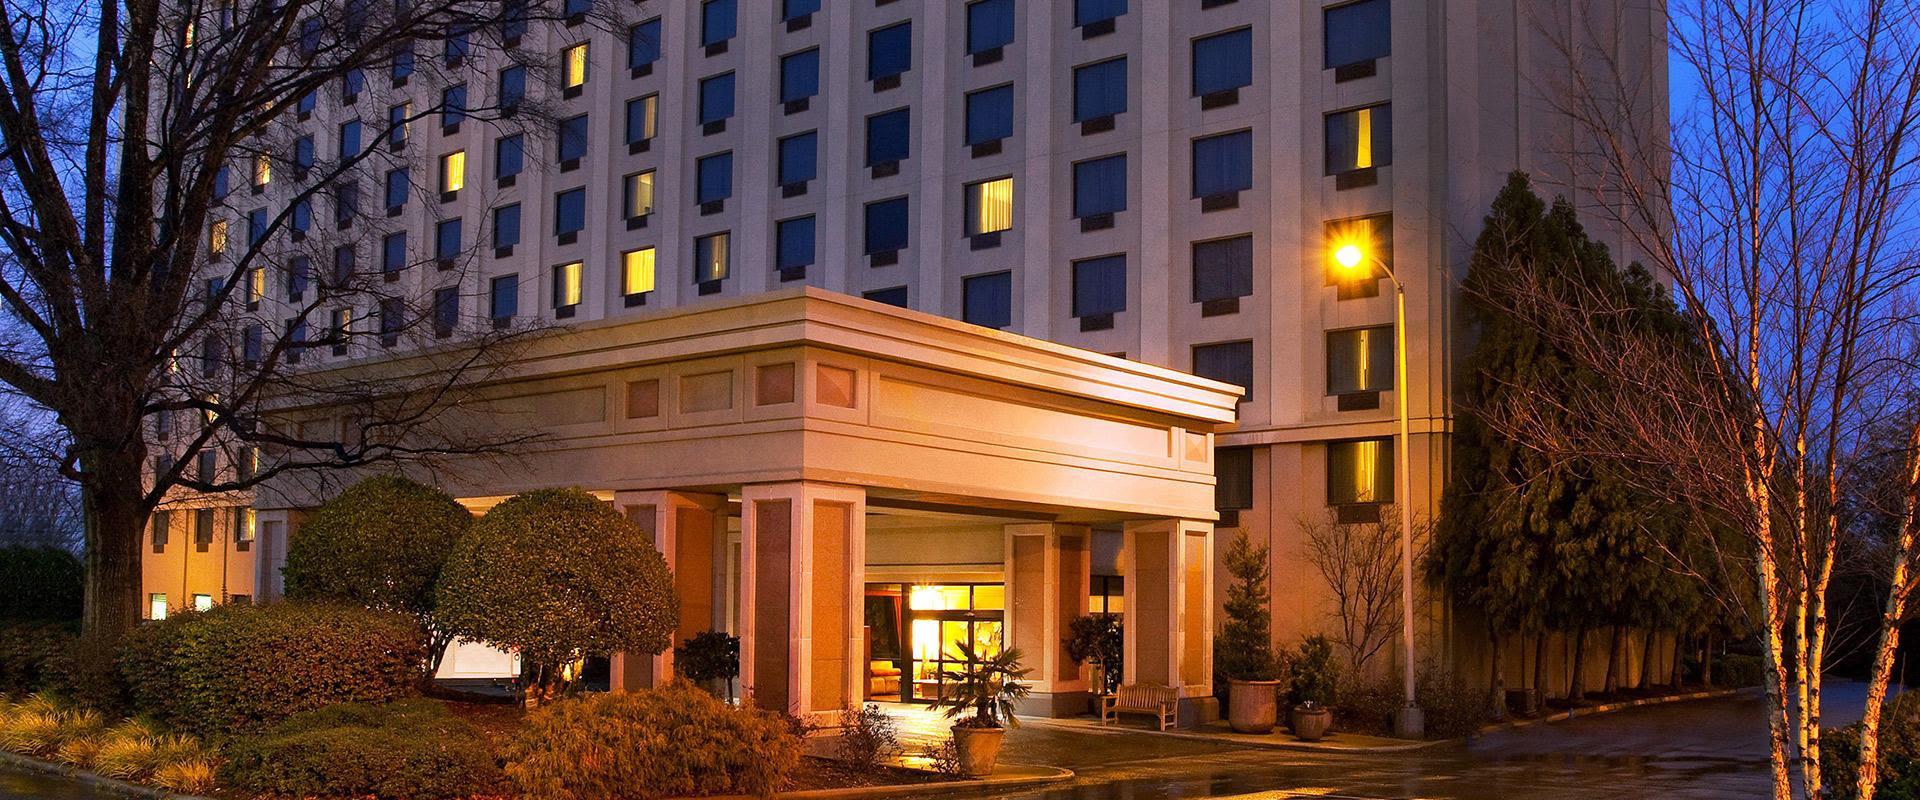 Atlanta Airport Hotel Exterior At Dusk